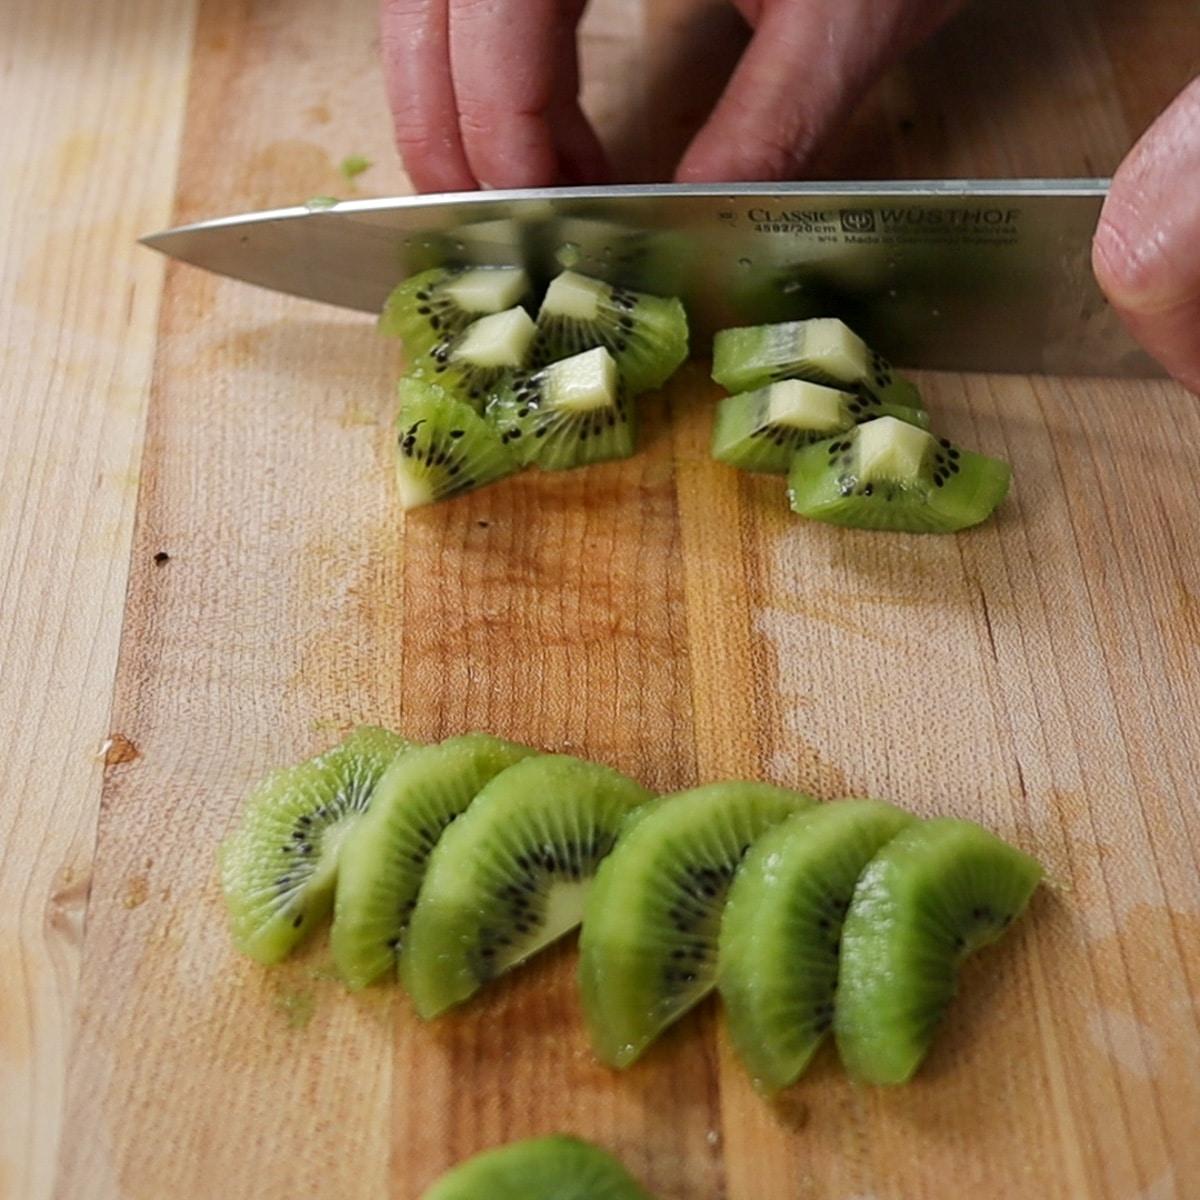 quartering slices of kiwi fruit